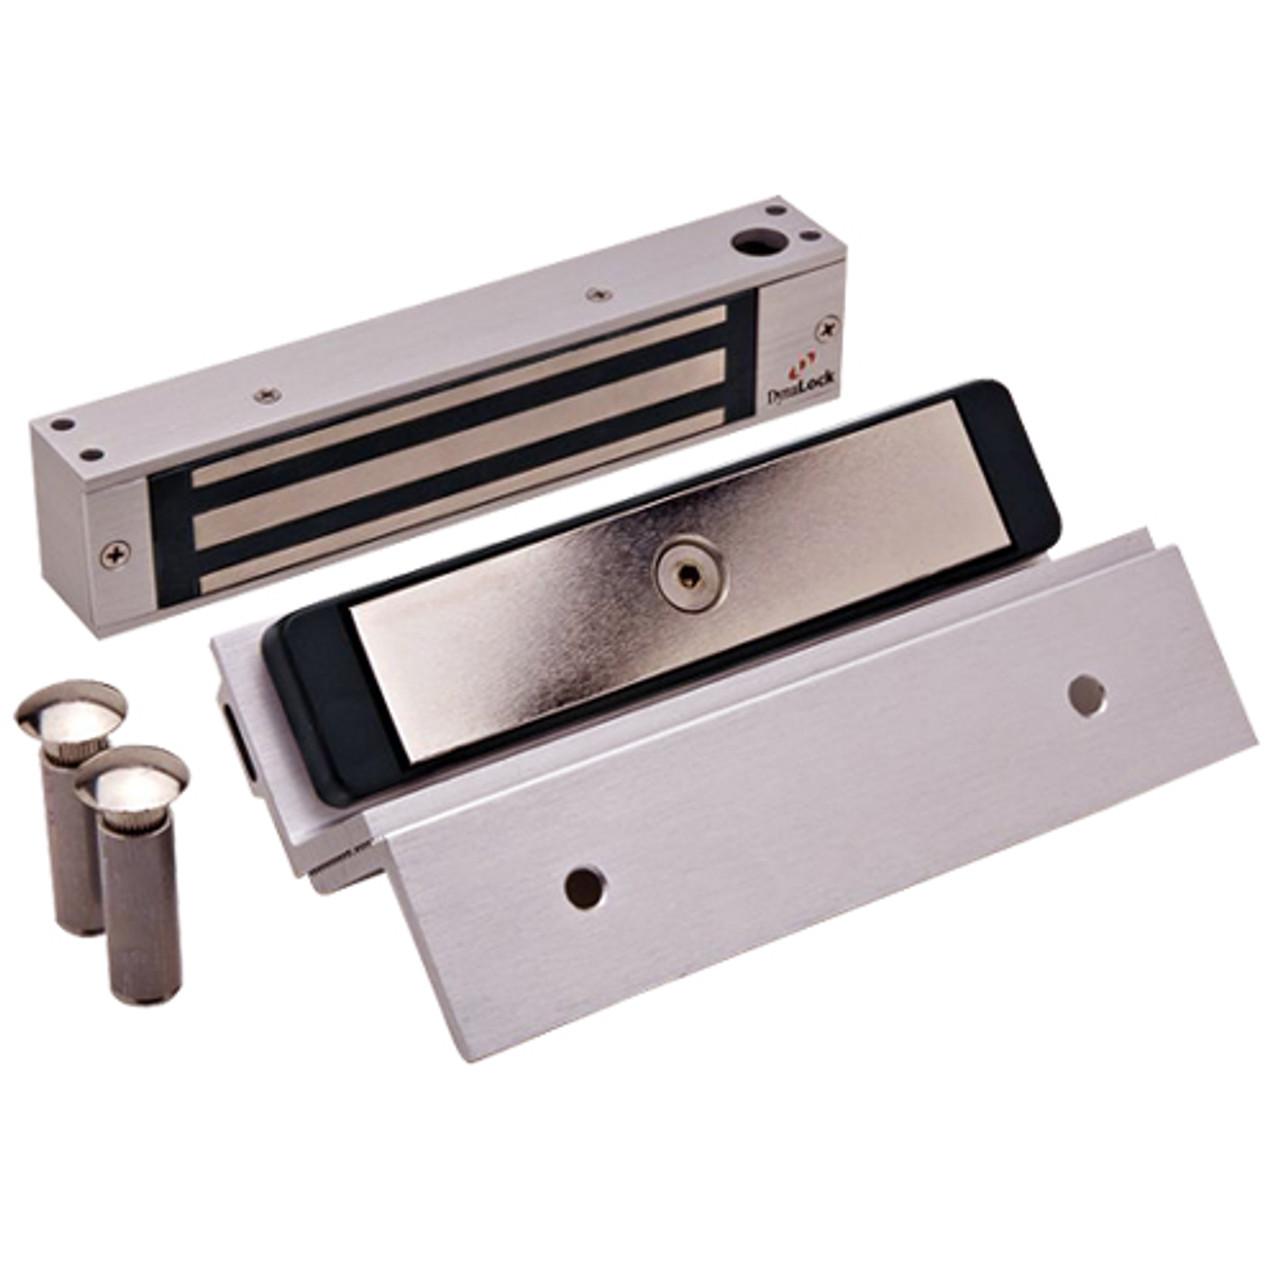 2585-TJ85-US28 DynaLock 2500 Series 650 LB Single Bantam Mini Electromagnetic Lock for Inswing Door in Satin Aluminum